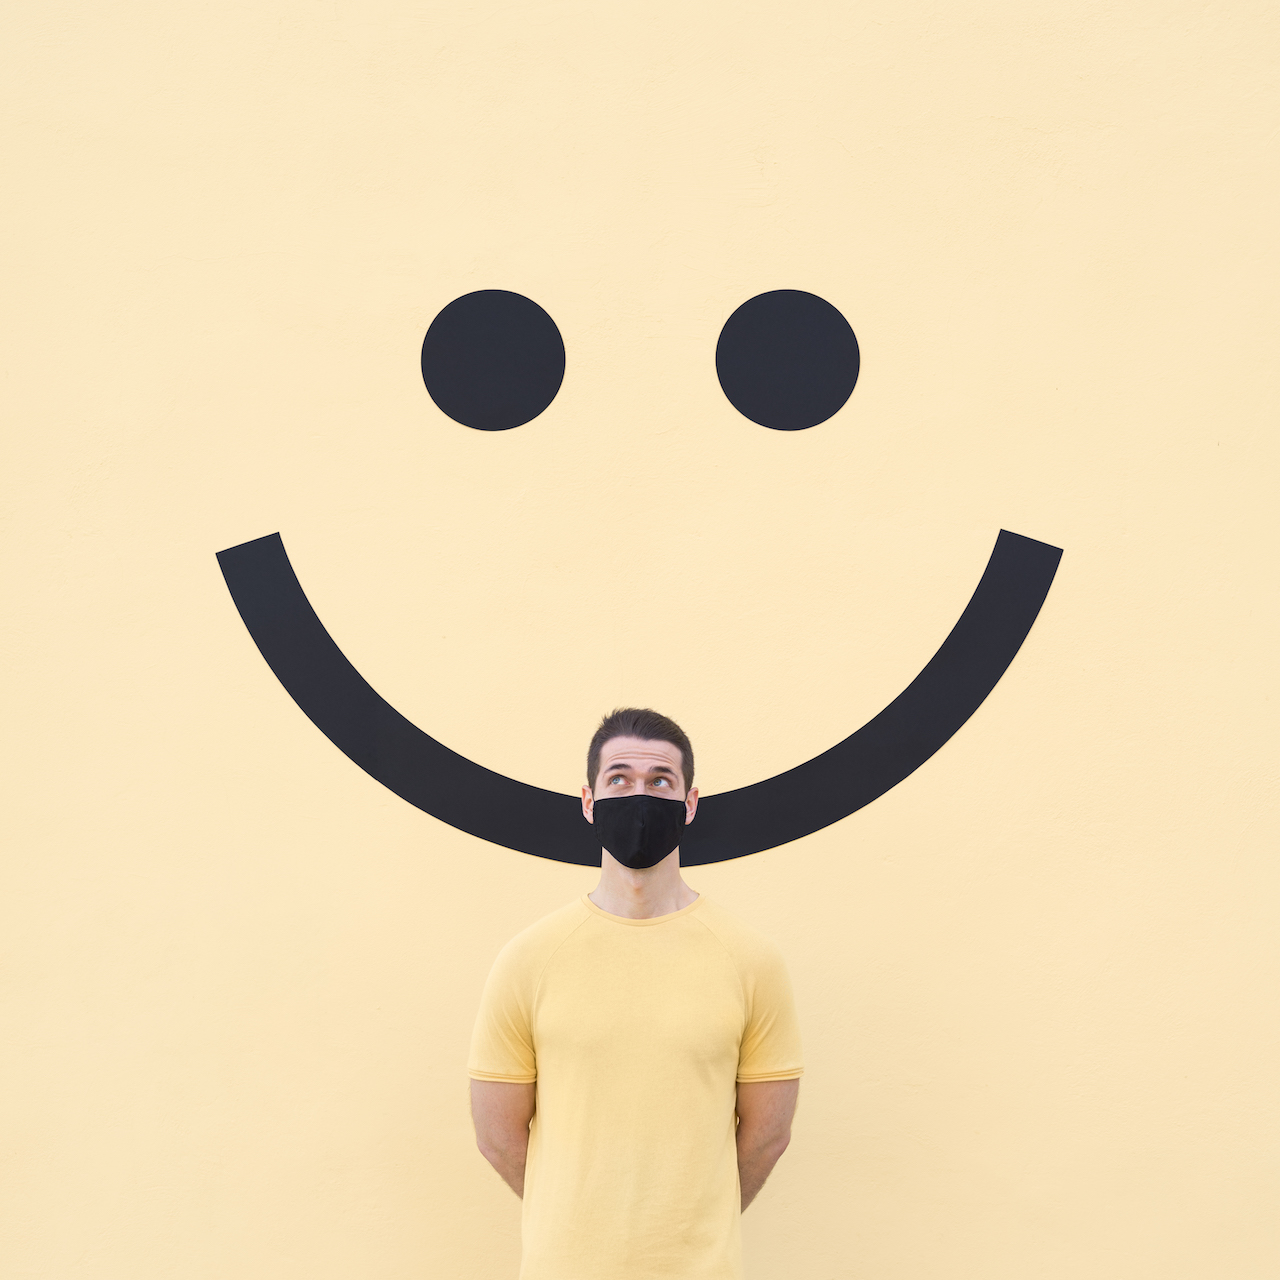 quarantineart mask mascarilla face covering yellow emoji smiley happy amarillo sonrisa coronavirus covidartmuseum Daniel Rueda Anna Devís anniset drcuerda annandaniel creative photography minimal fine art creative